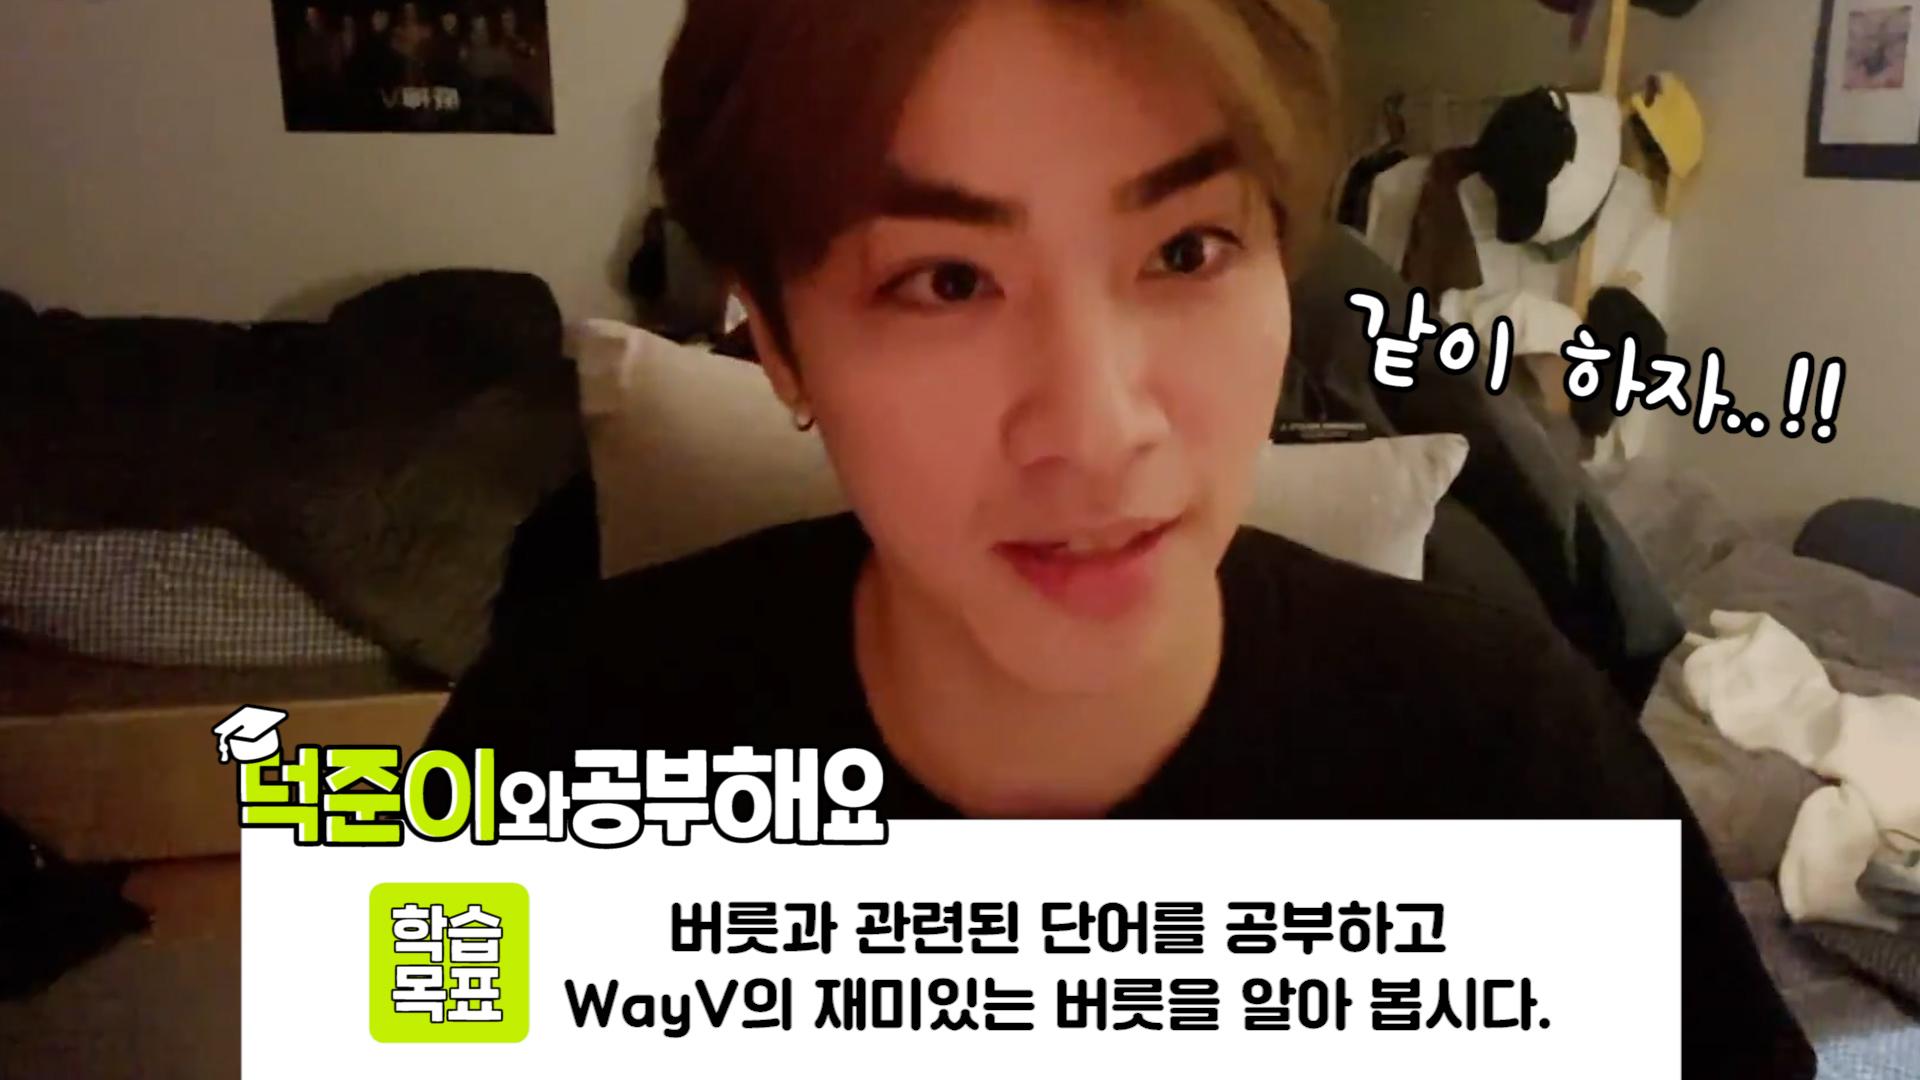 [WayV] 덕준이랑 한국어 공부 같이 하자..‼️ (XIAOJUN studying Korean)